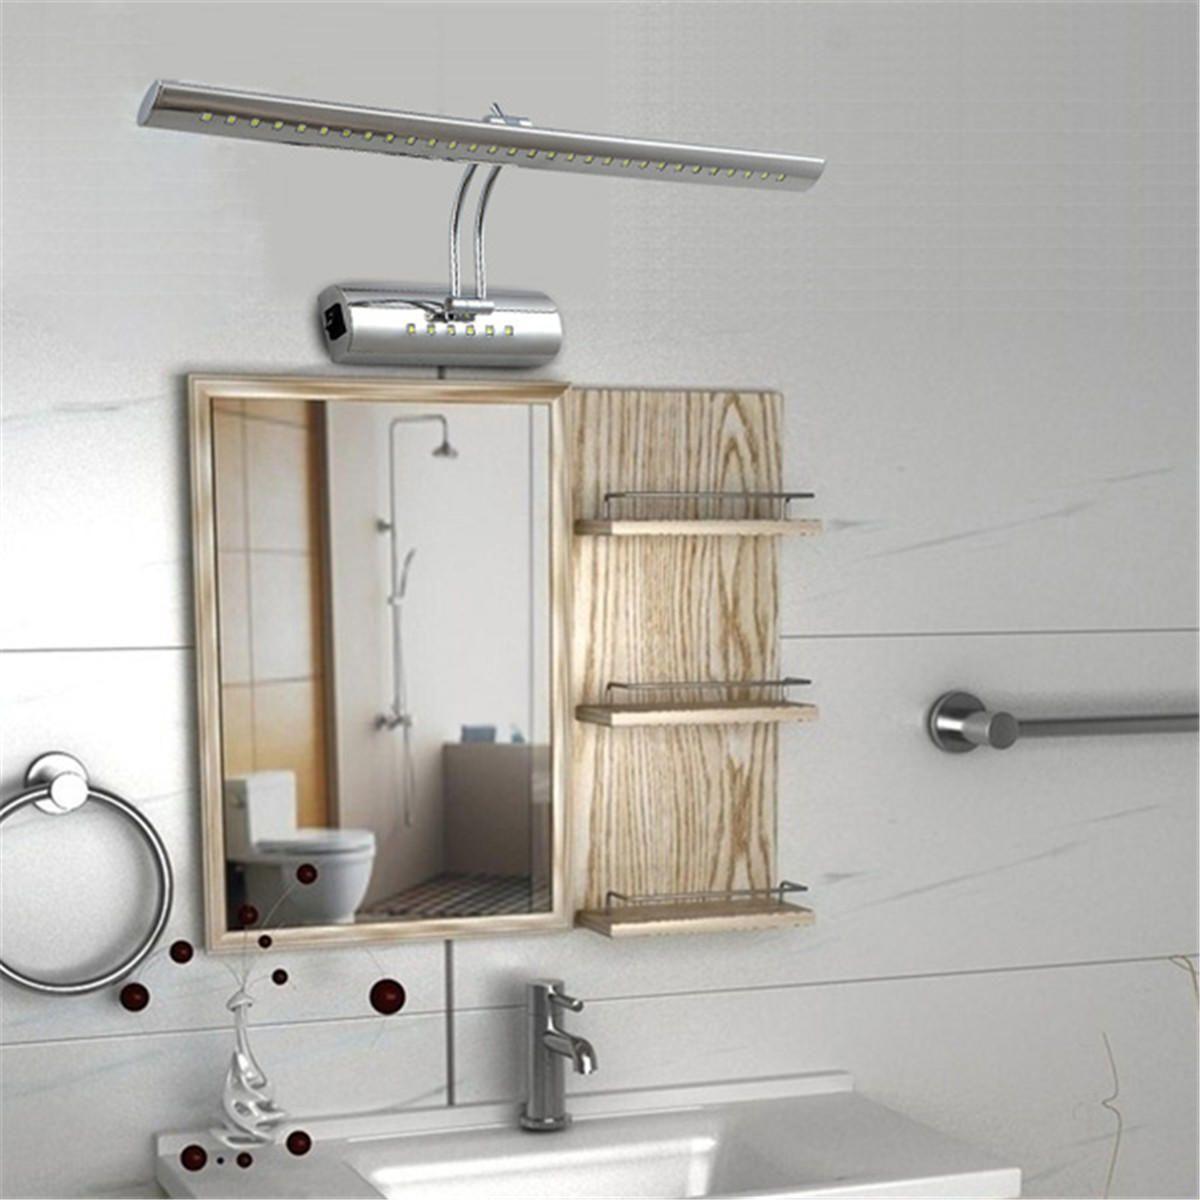 Crystal ledmirror light bubble crystal stainless steel bathroom mirror - 5w Stainless Steel Led Mirror Light Waterproof Home Bathroom Wall Lamp